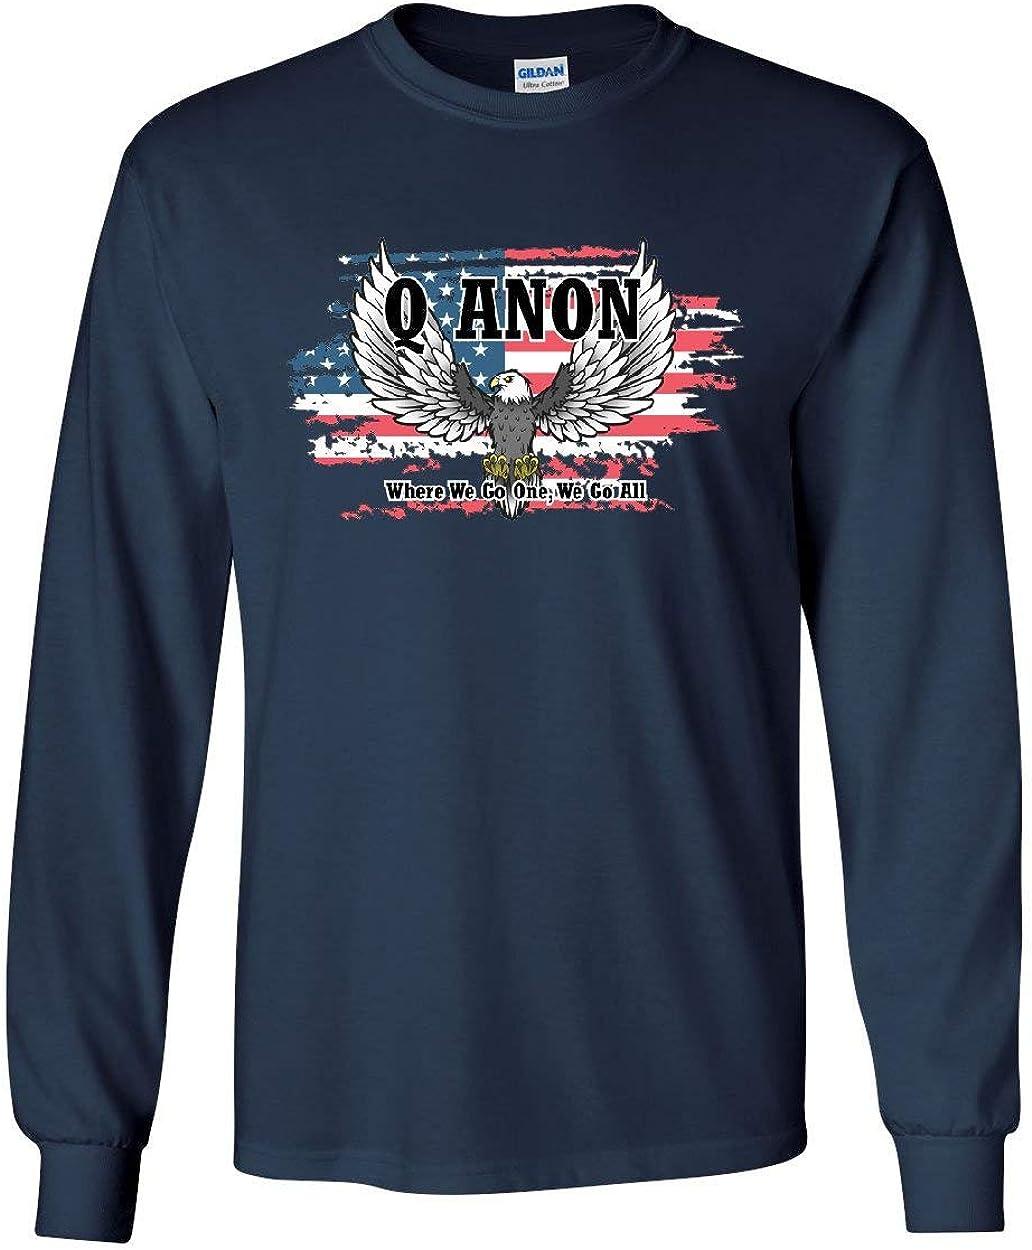 Where We go one We go All America Long Sleeve T-Shirt